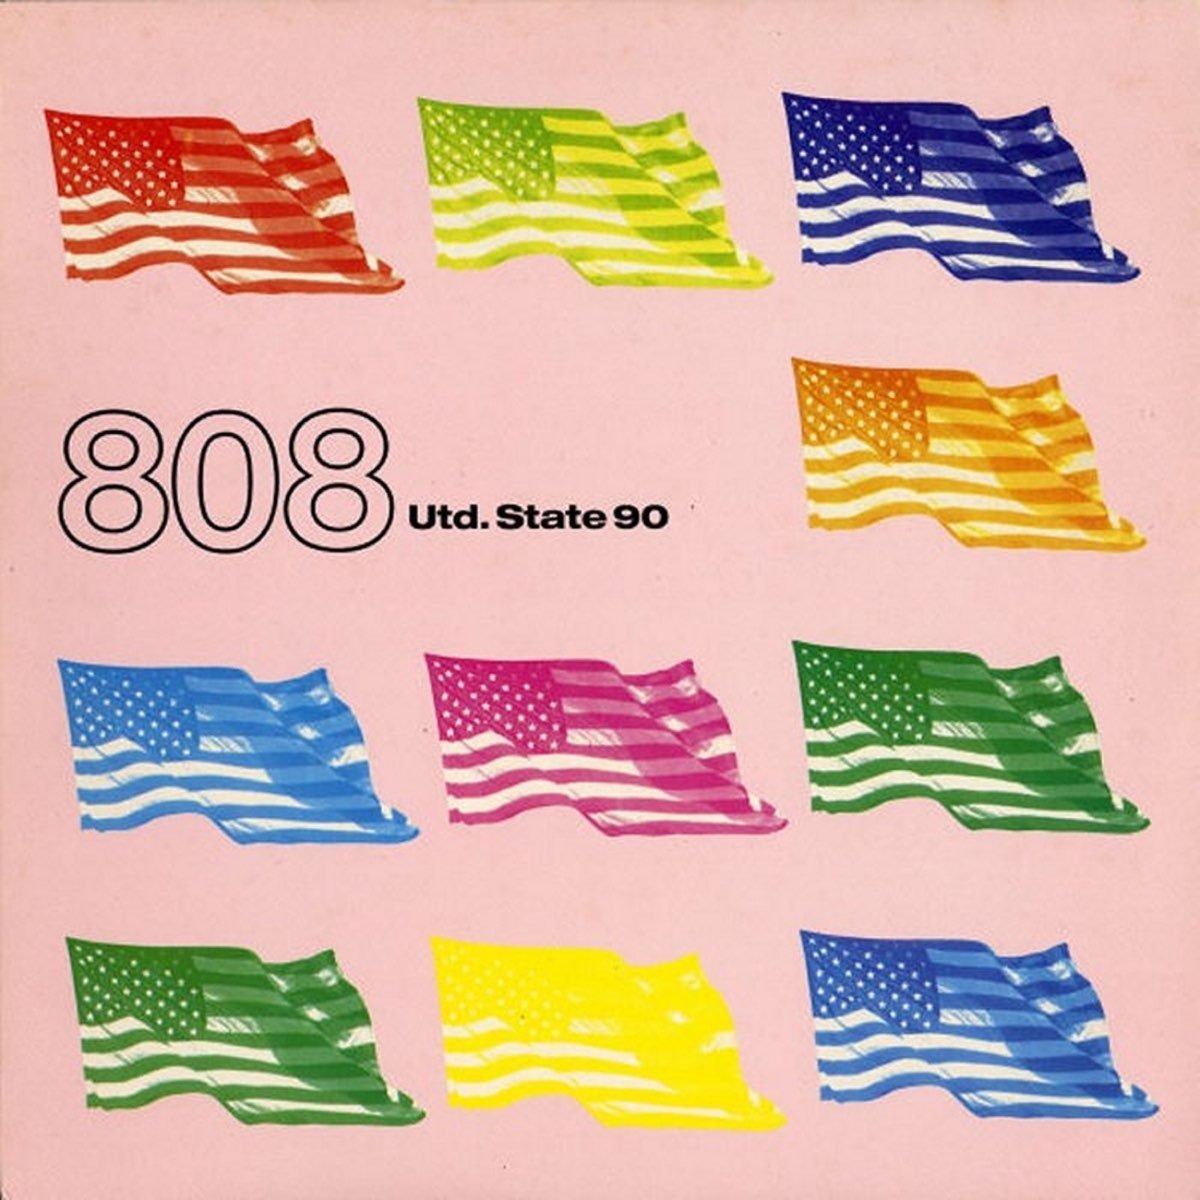 Review: 808 State, Utd  State 90 - Slant Magazine